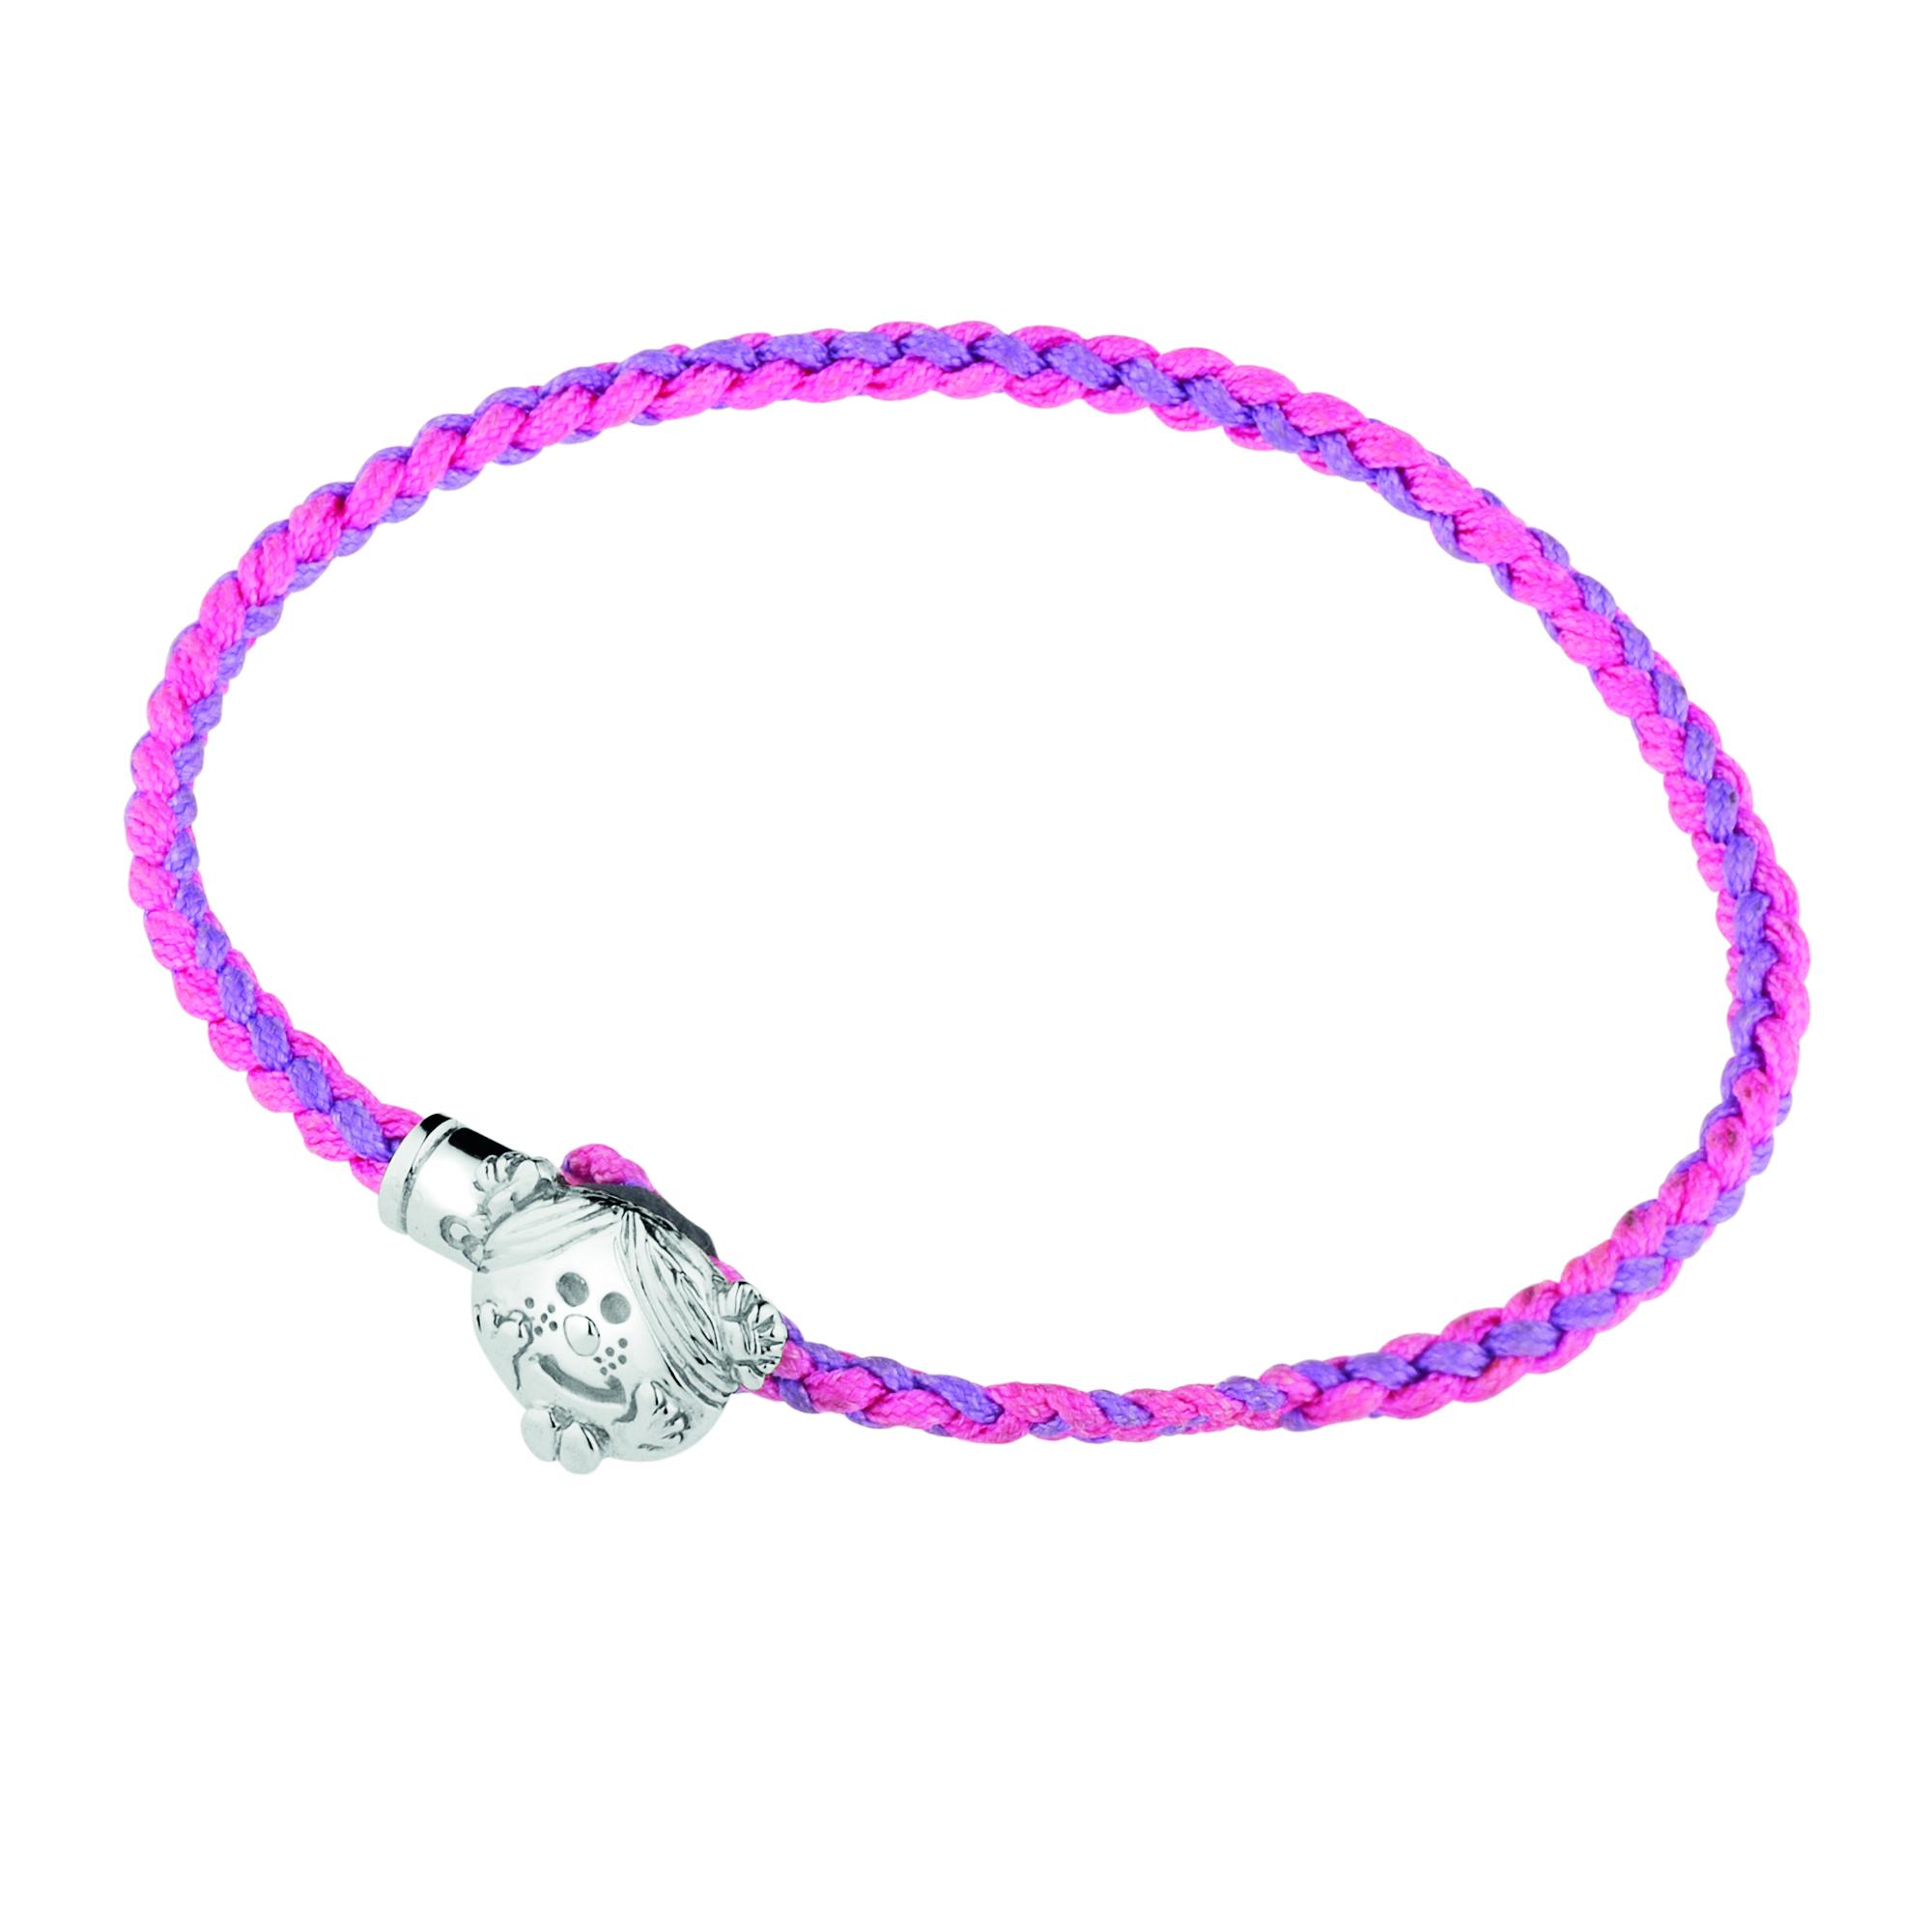 LINKS OF LONDON - Κοριτσίστικο βραχιόλι Little Miss Sunshine ροζ παιδικά girls αξεσουάρ κοσμήματα